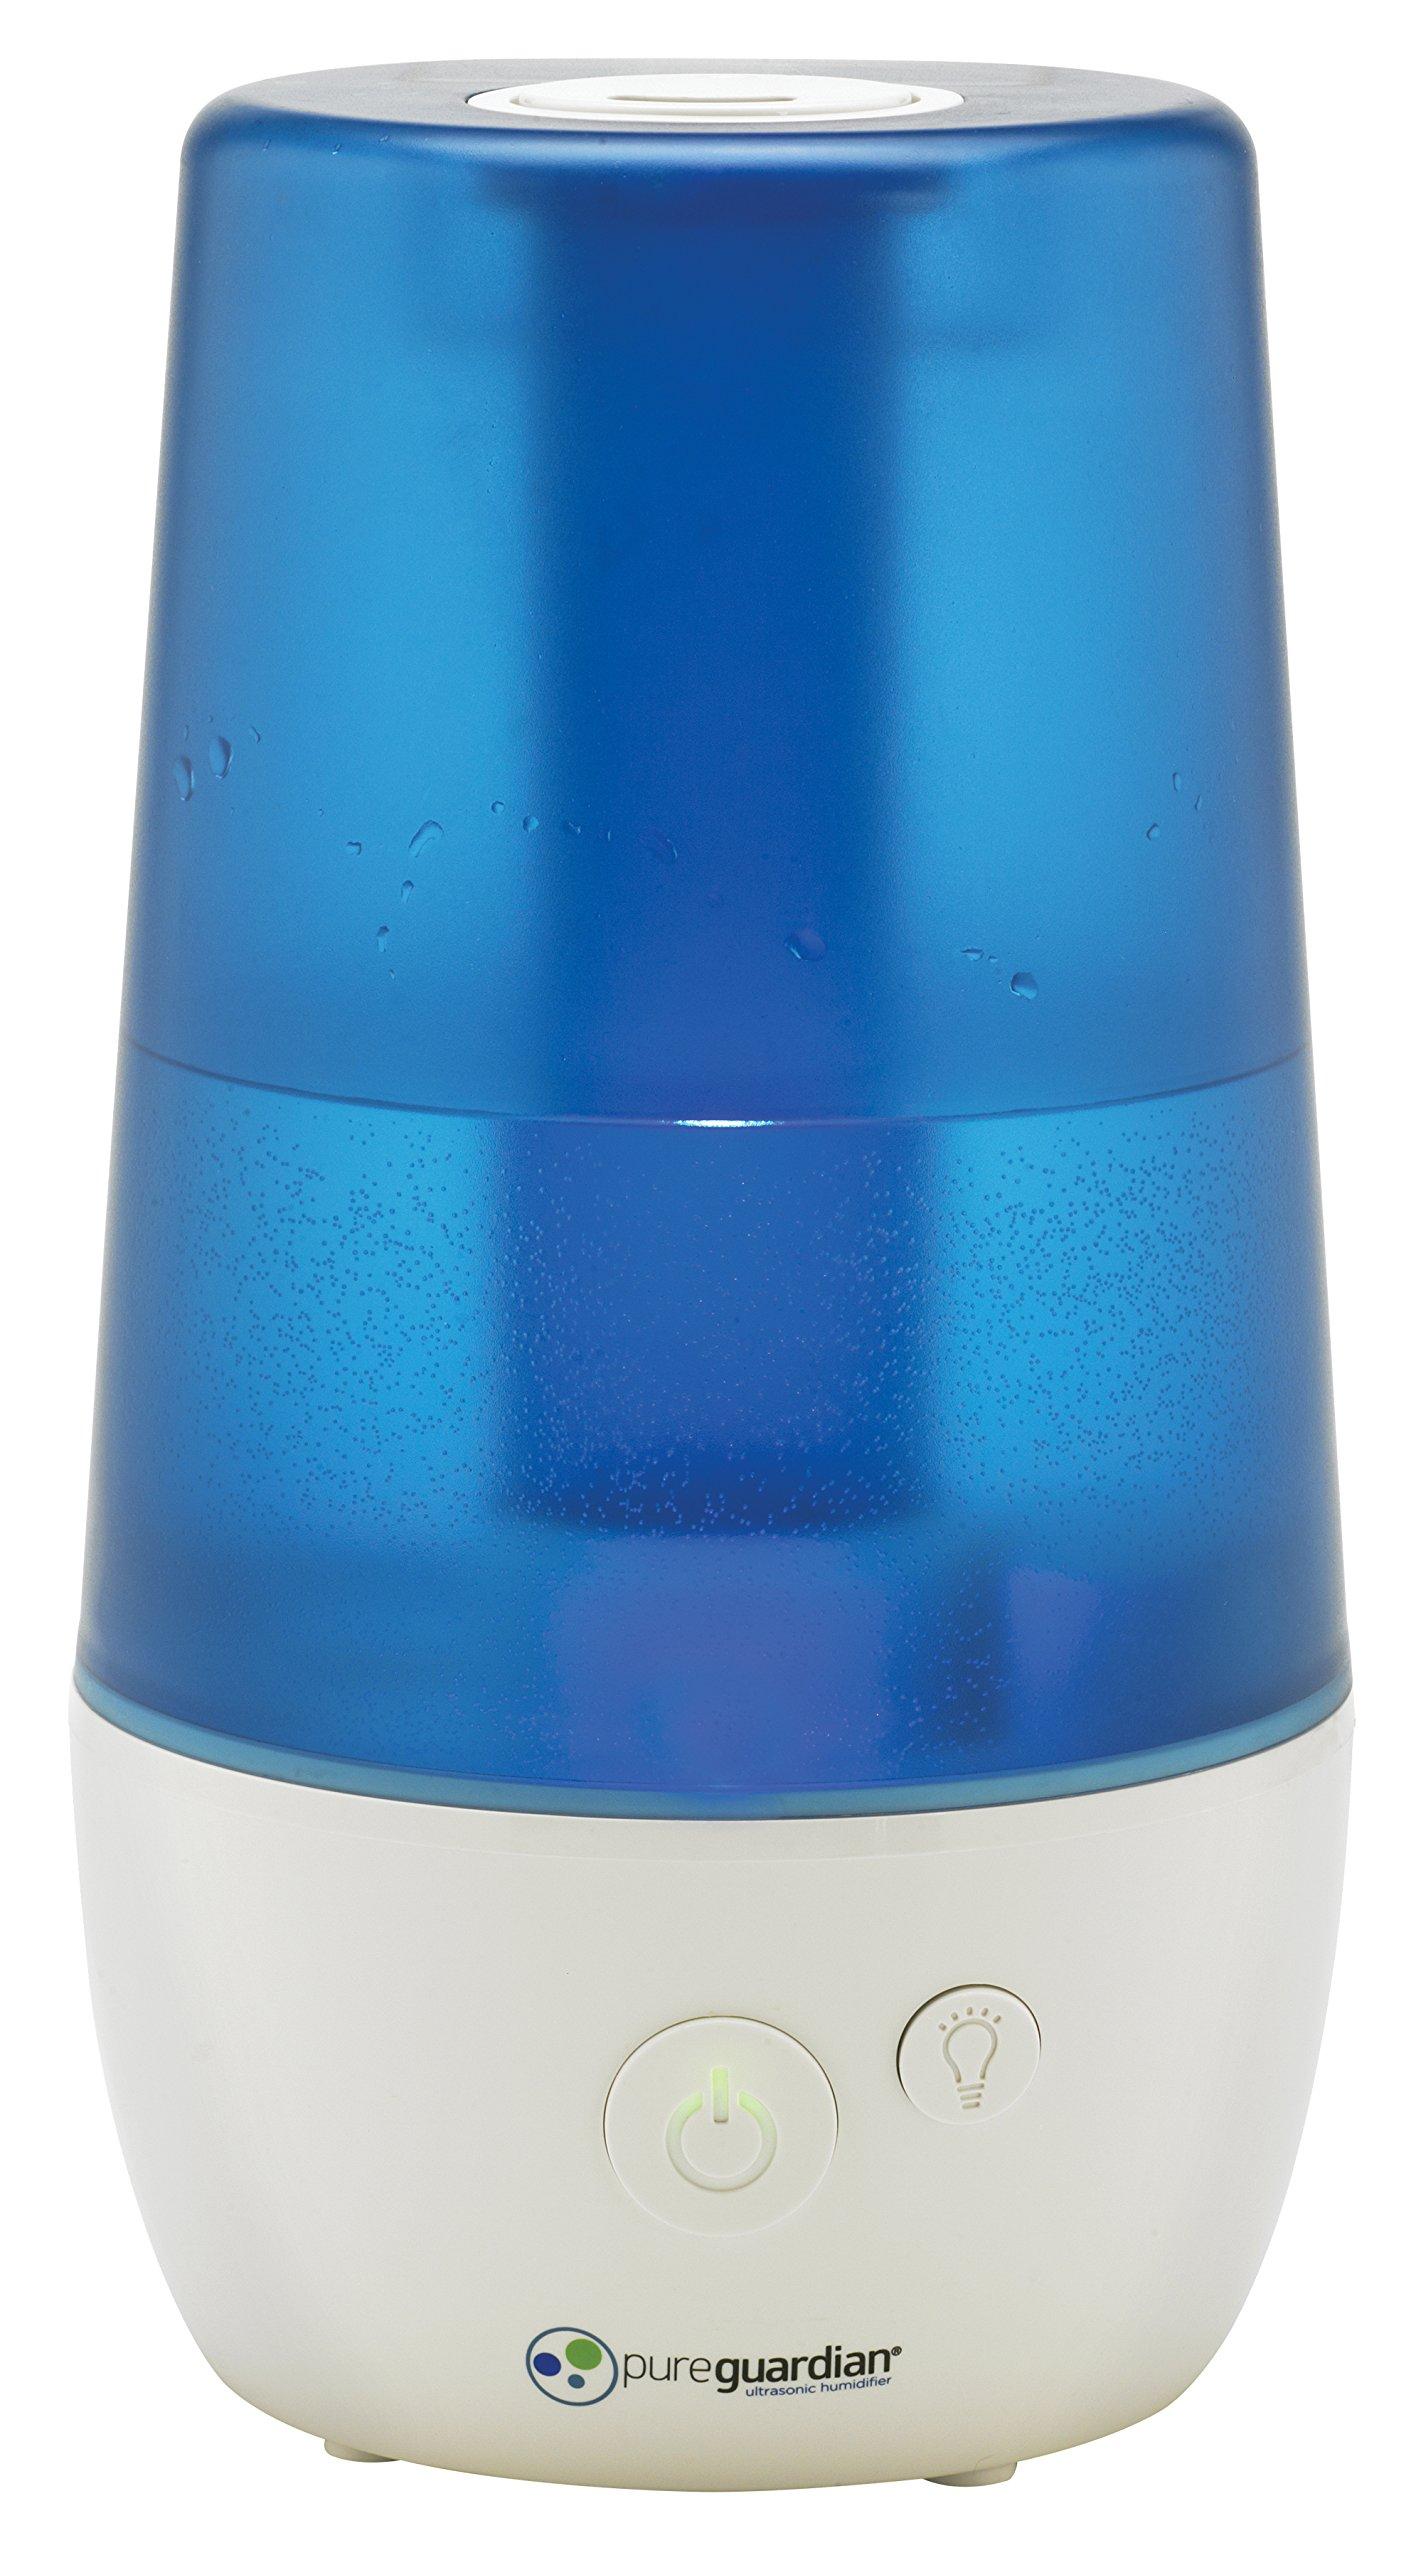 PureGuardian Ultrasonic Cool Mist Humidifier, 1 Gallon Tank, Personal Humidifier, Room Humidifier, Desktop Humidifier, Baby Humidifier, Small Humidifier, Pure Guardian H965